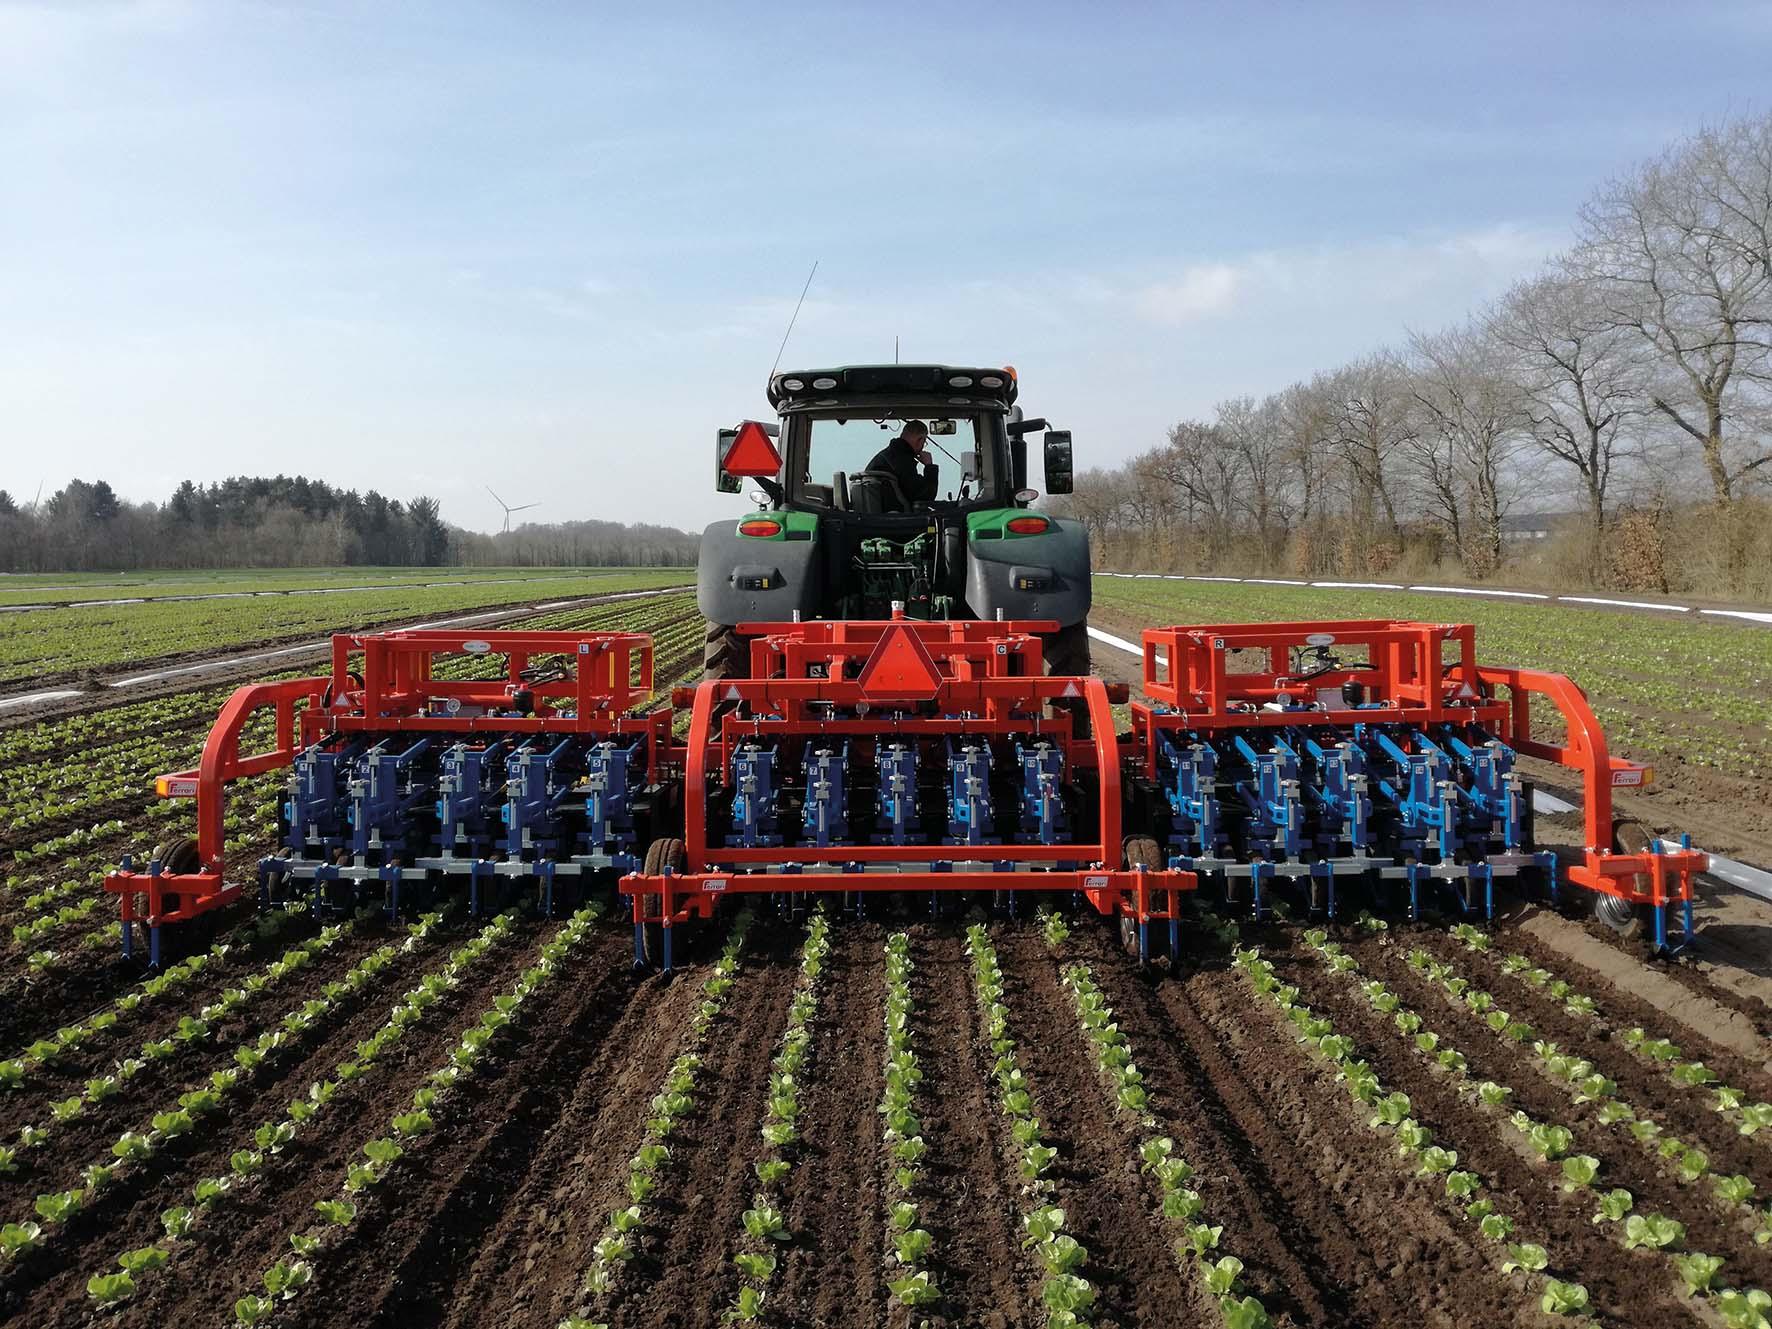 15 lines Ferrari automated weeder - Agri Machines World